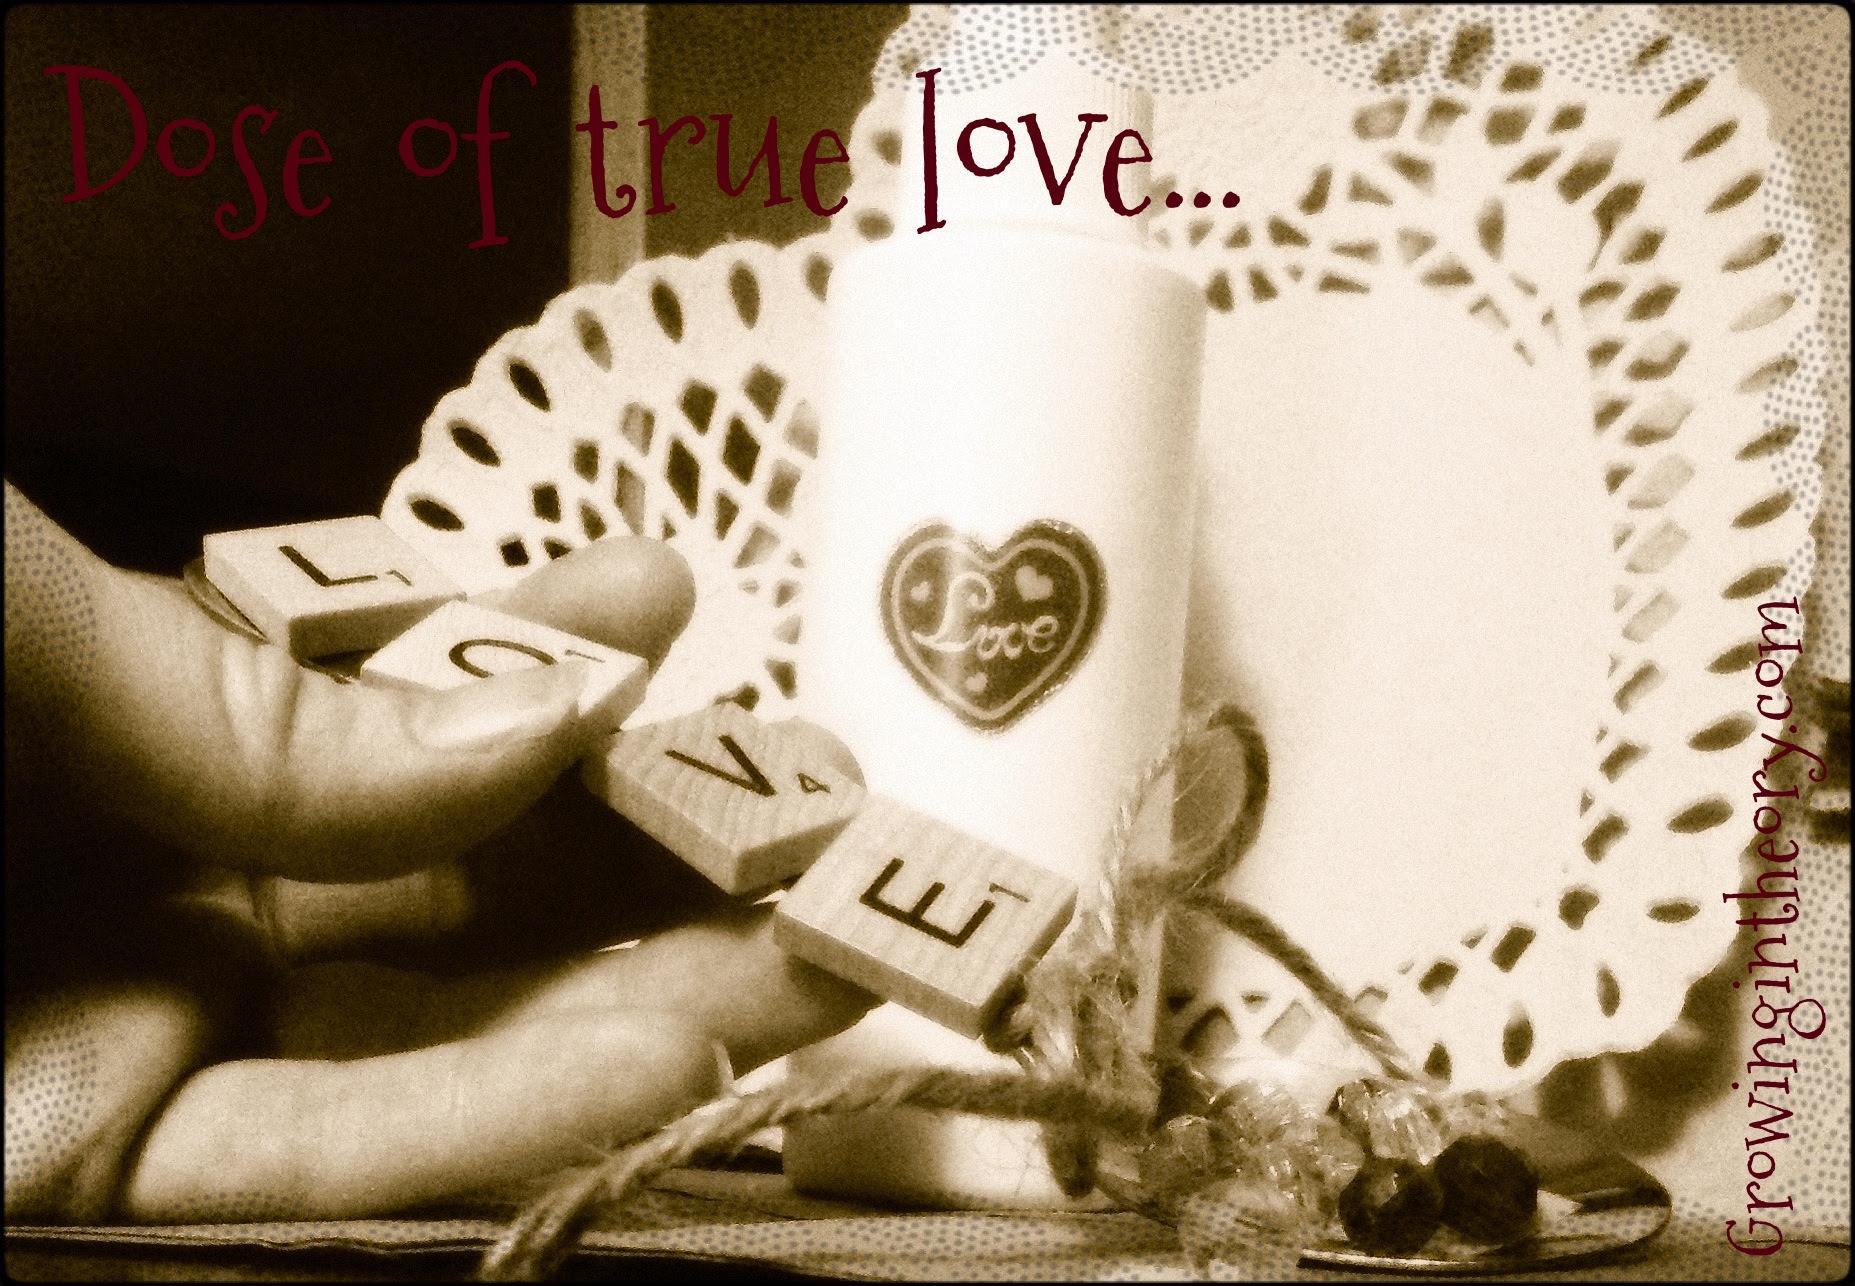 dose of true love